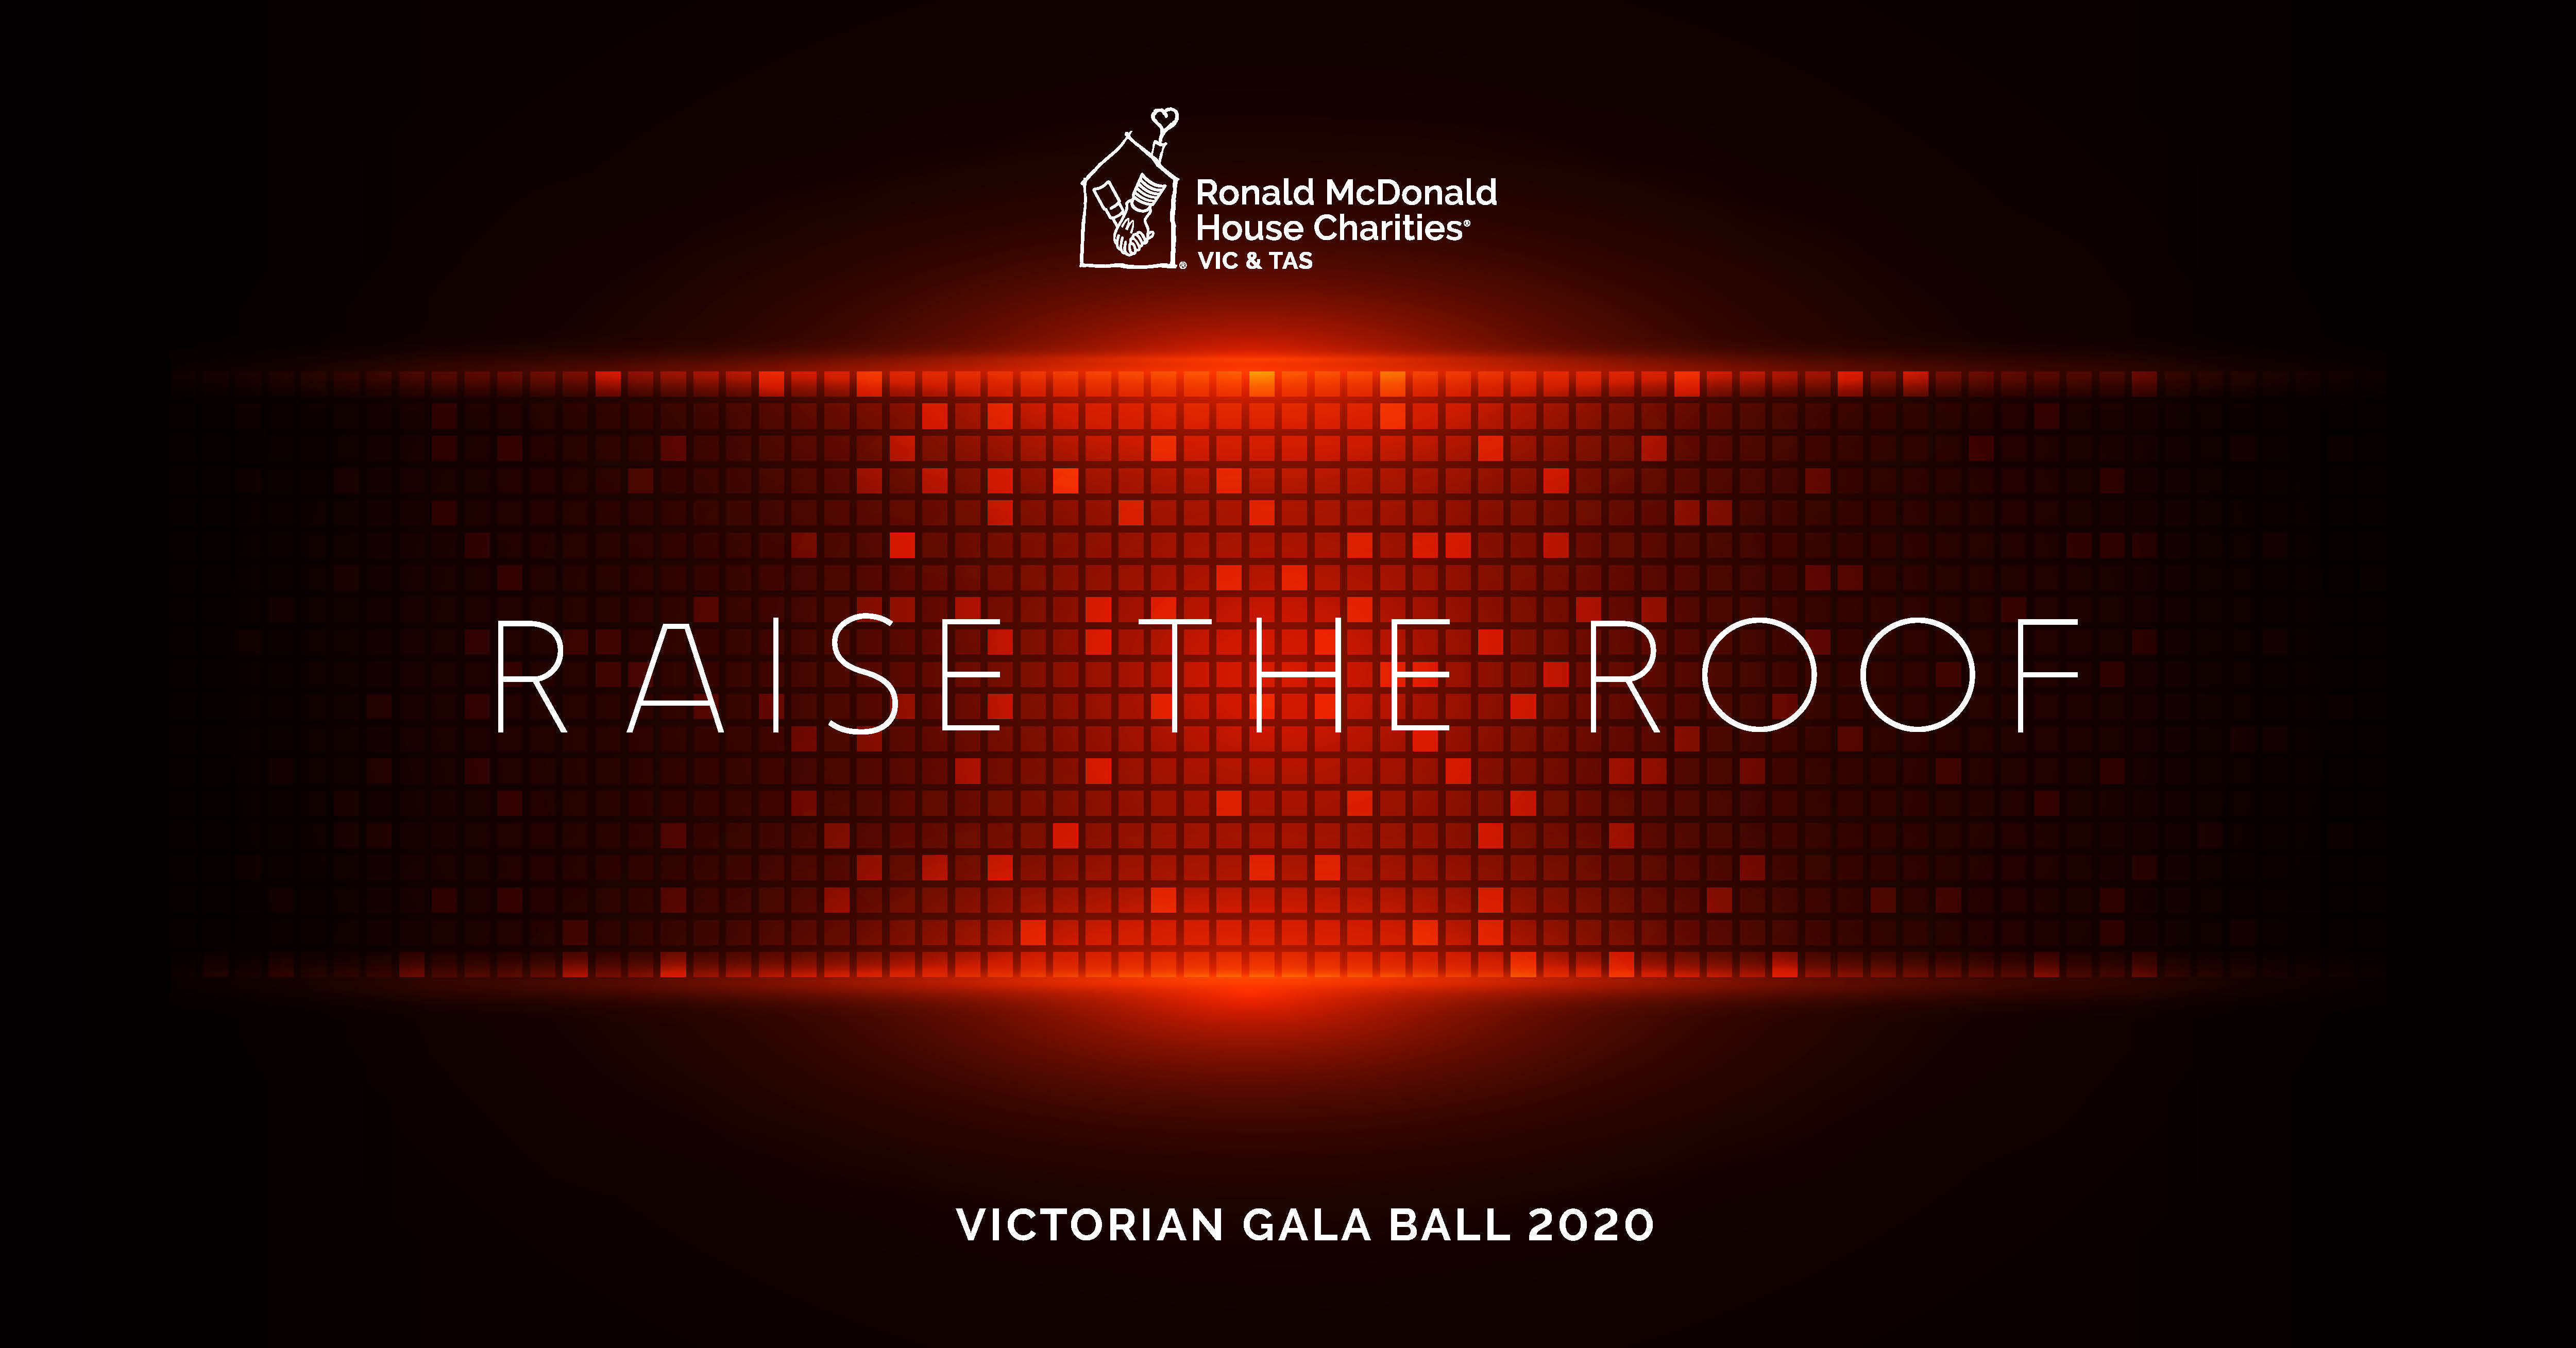 RMHC VIC & TAS Victorian Gala Ball